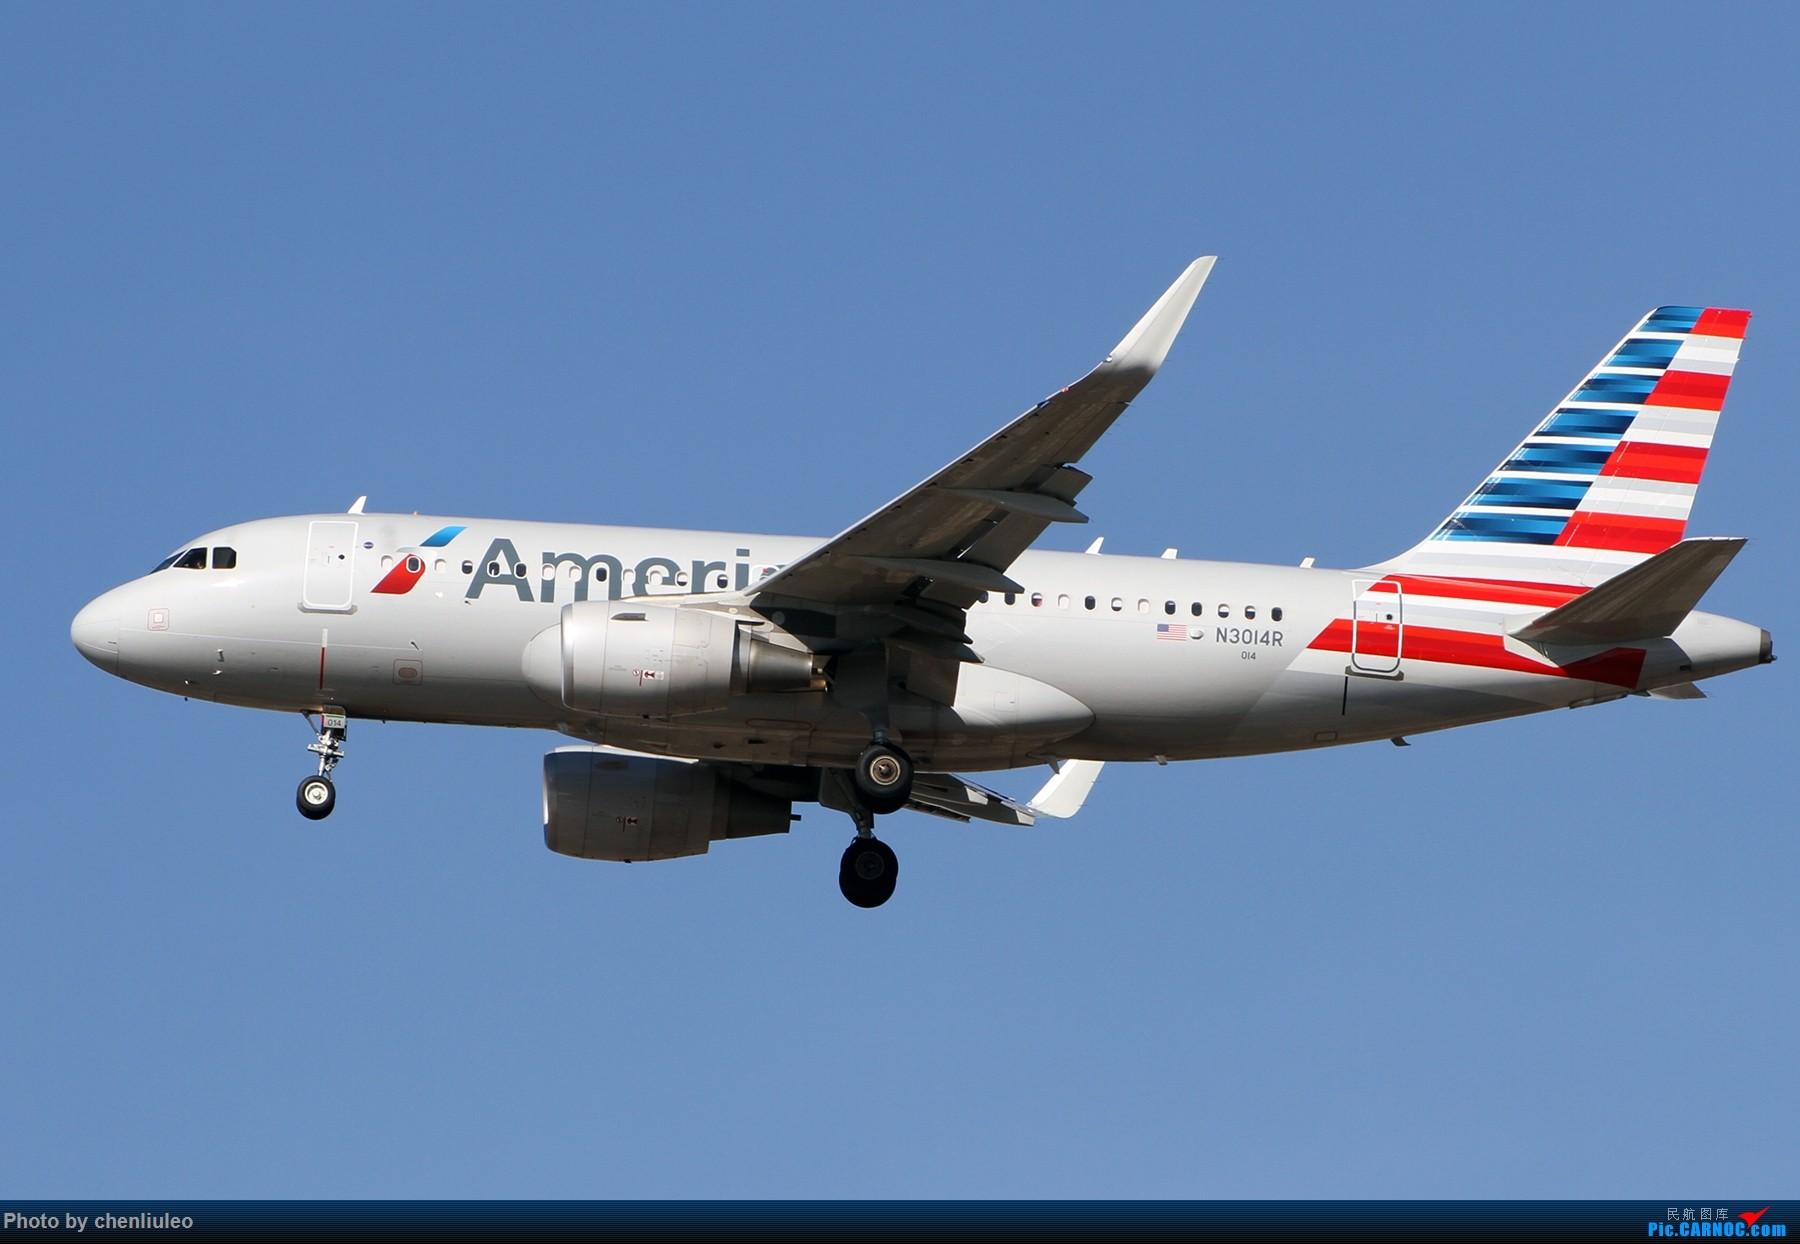 Re:[原创]【杭州飞友会】KSTL拍机。AA WN DL F9 BBJ 1800大图 AIRBUS A319-115WL N3014R 美国圣路易斯机场